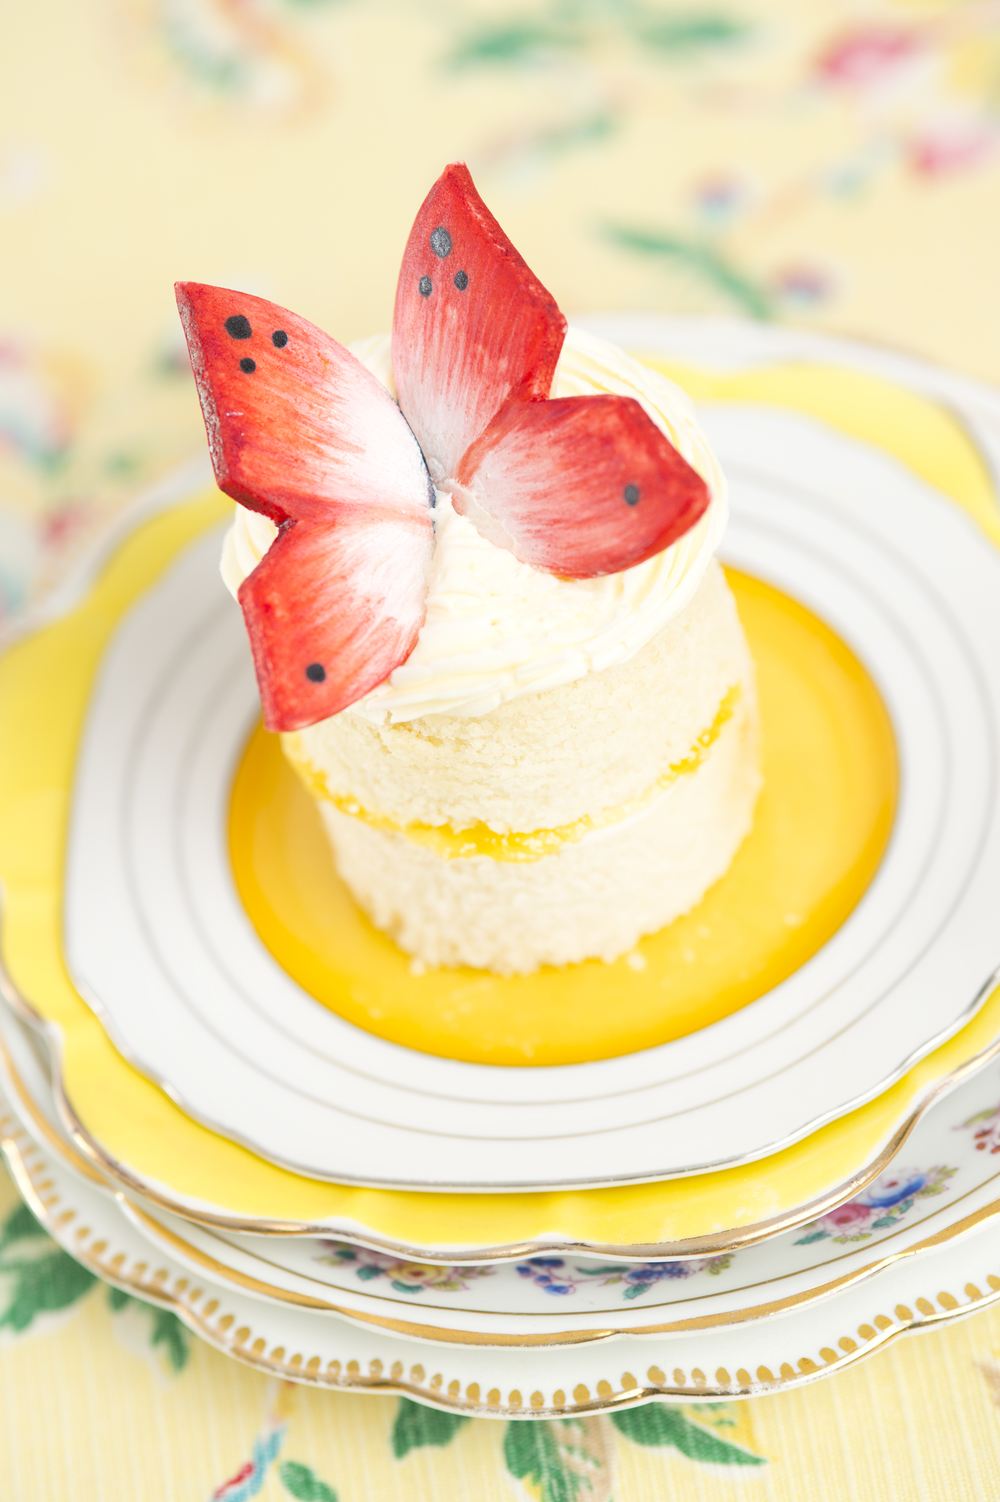 Cakes5189.jpg